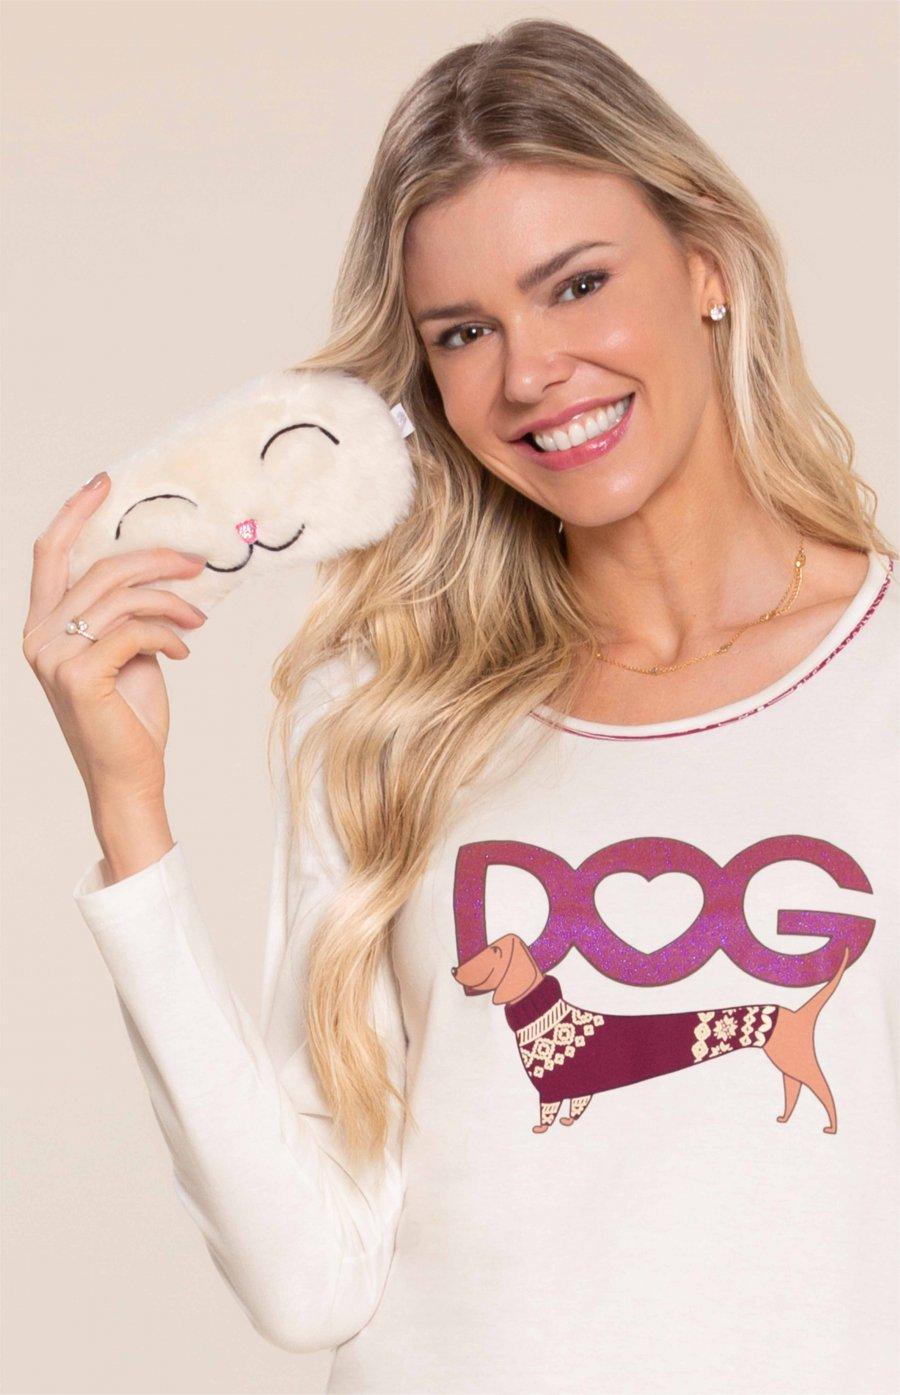 PROMO DE ACESSÓRIOS Máscara de Dormir Little Dog Inverno 2020 SWEET STORIES